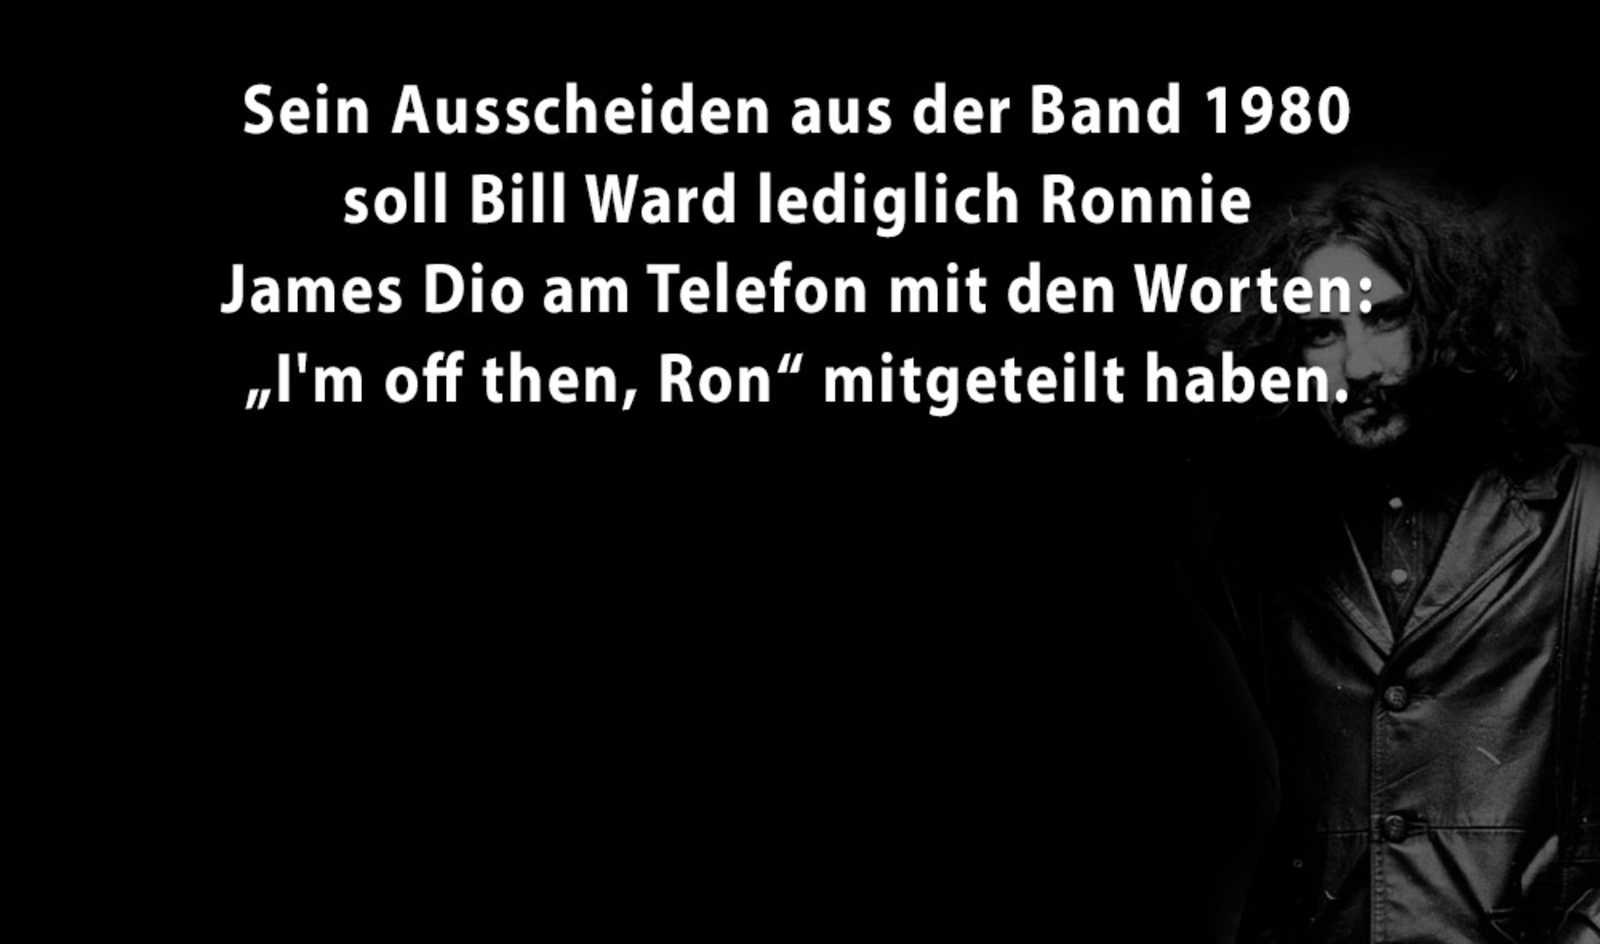 5 Facts über Bill Ward